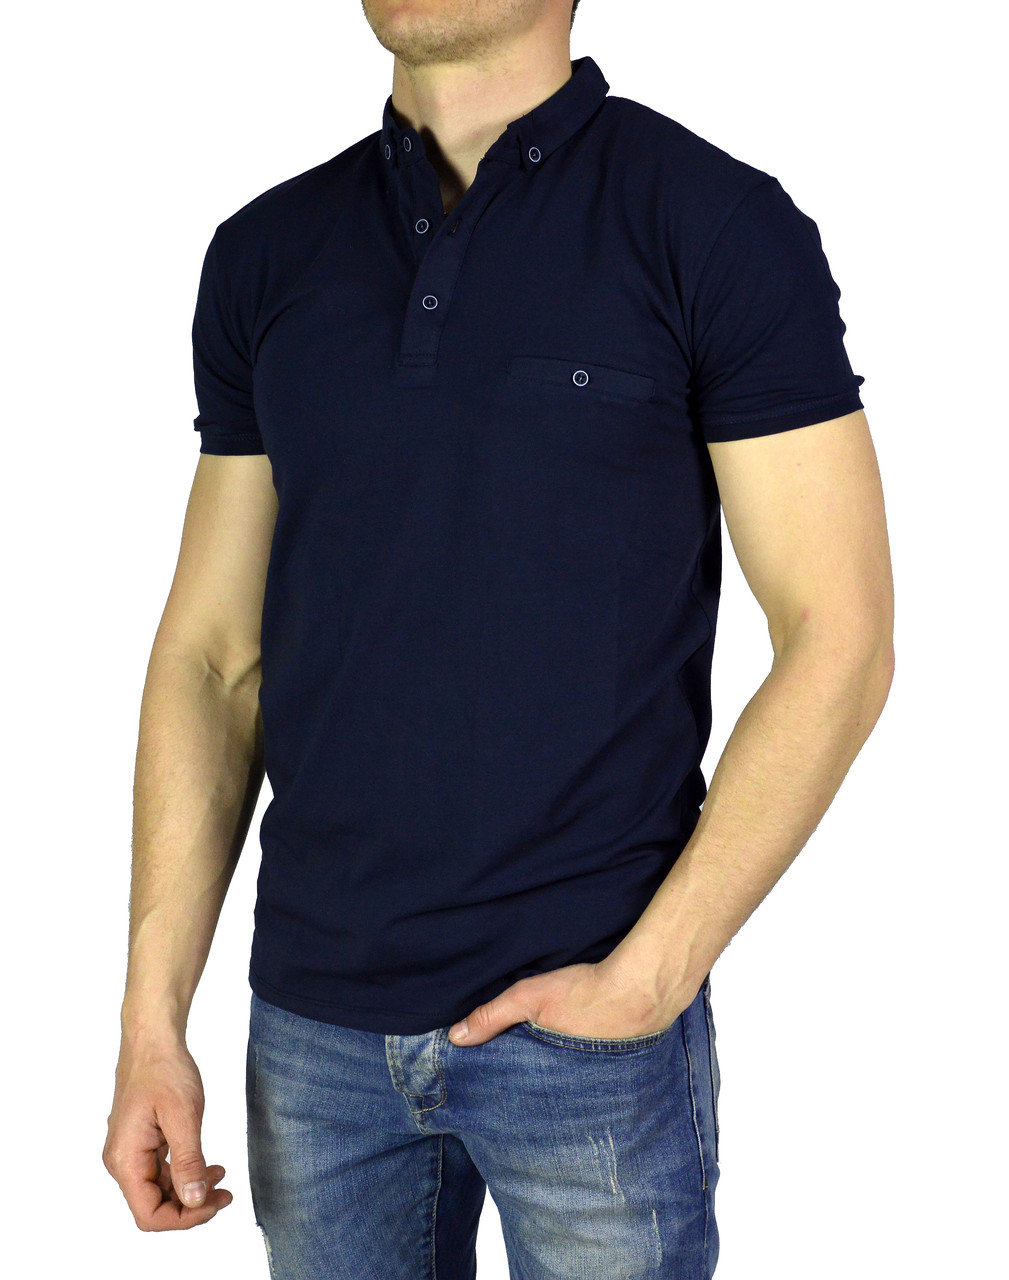 Темно-синяя мужская футболка с воротником поло BY MASURA